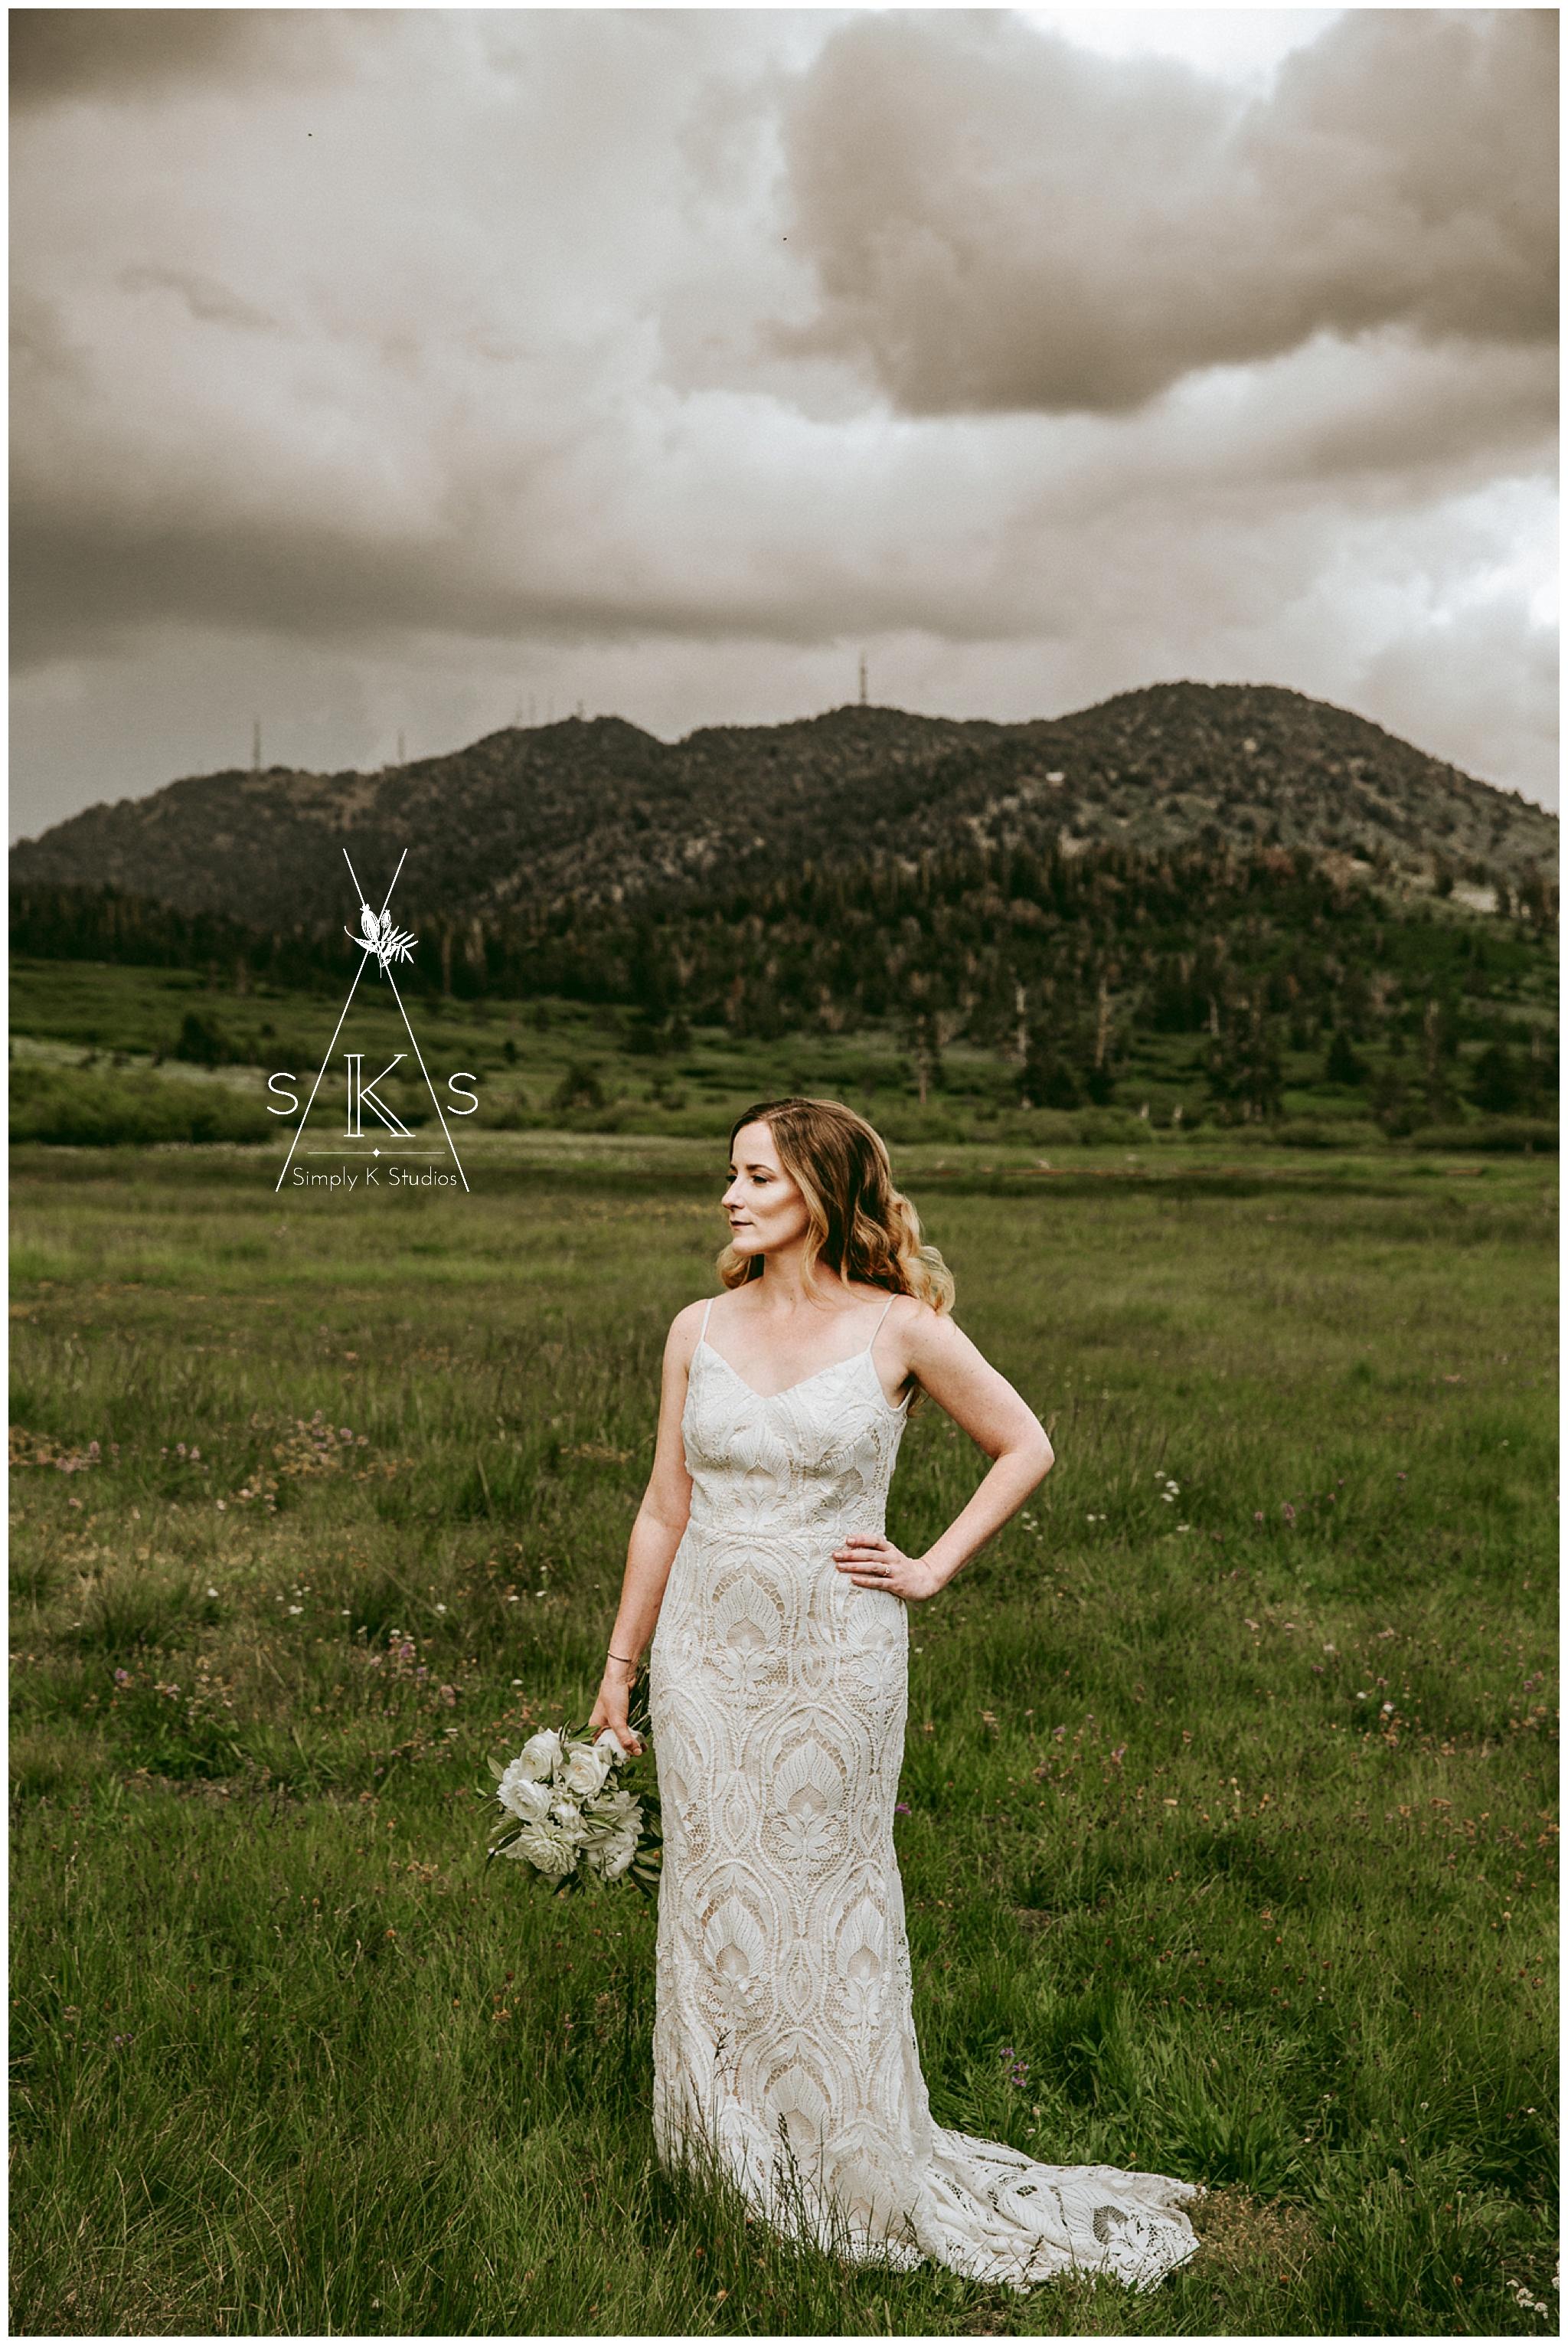 55 Simply K Studios Connecticut Wedding Photographers.jpg